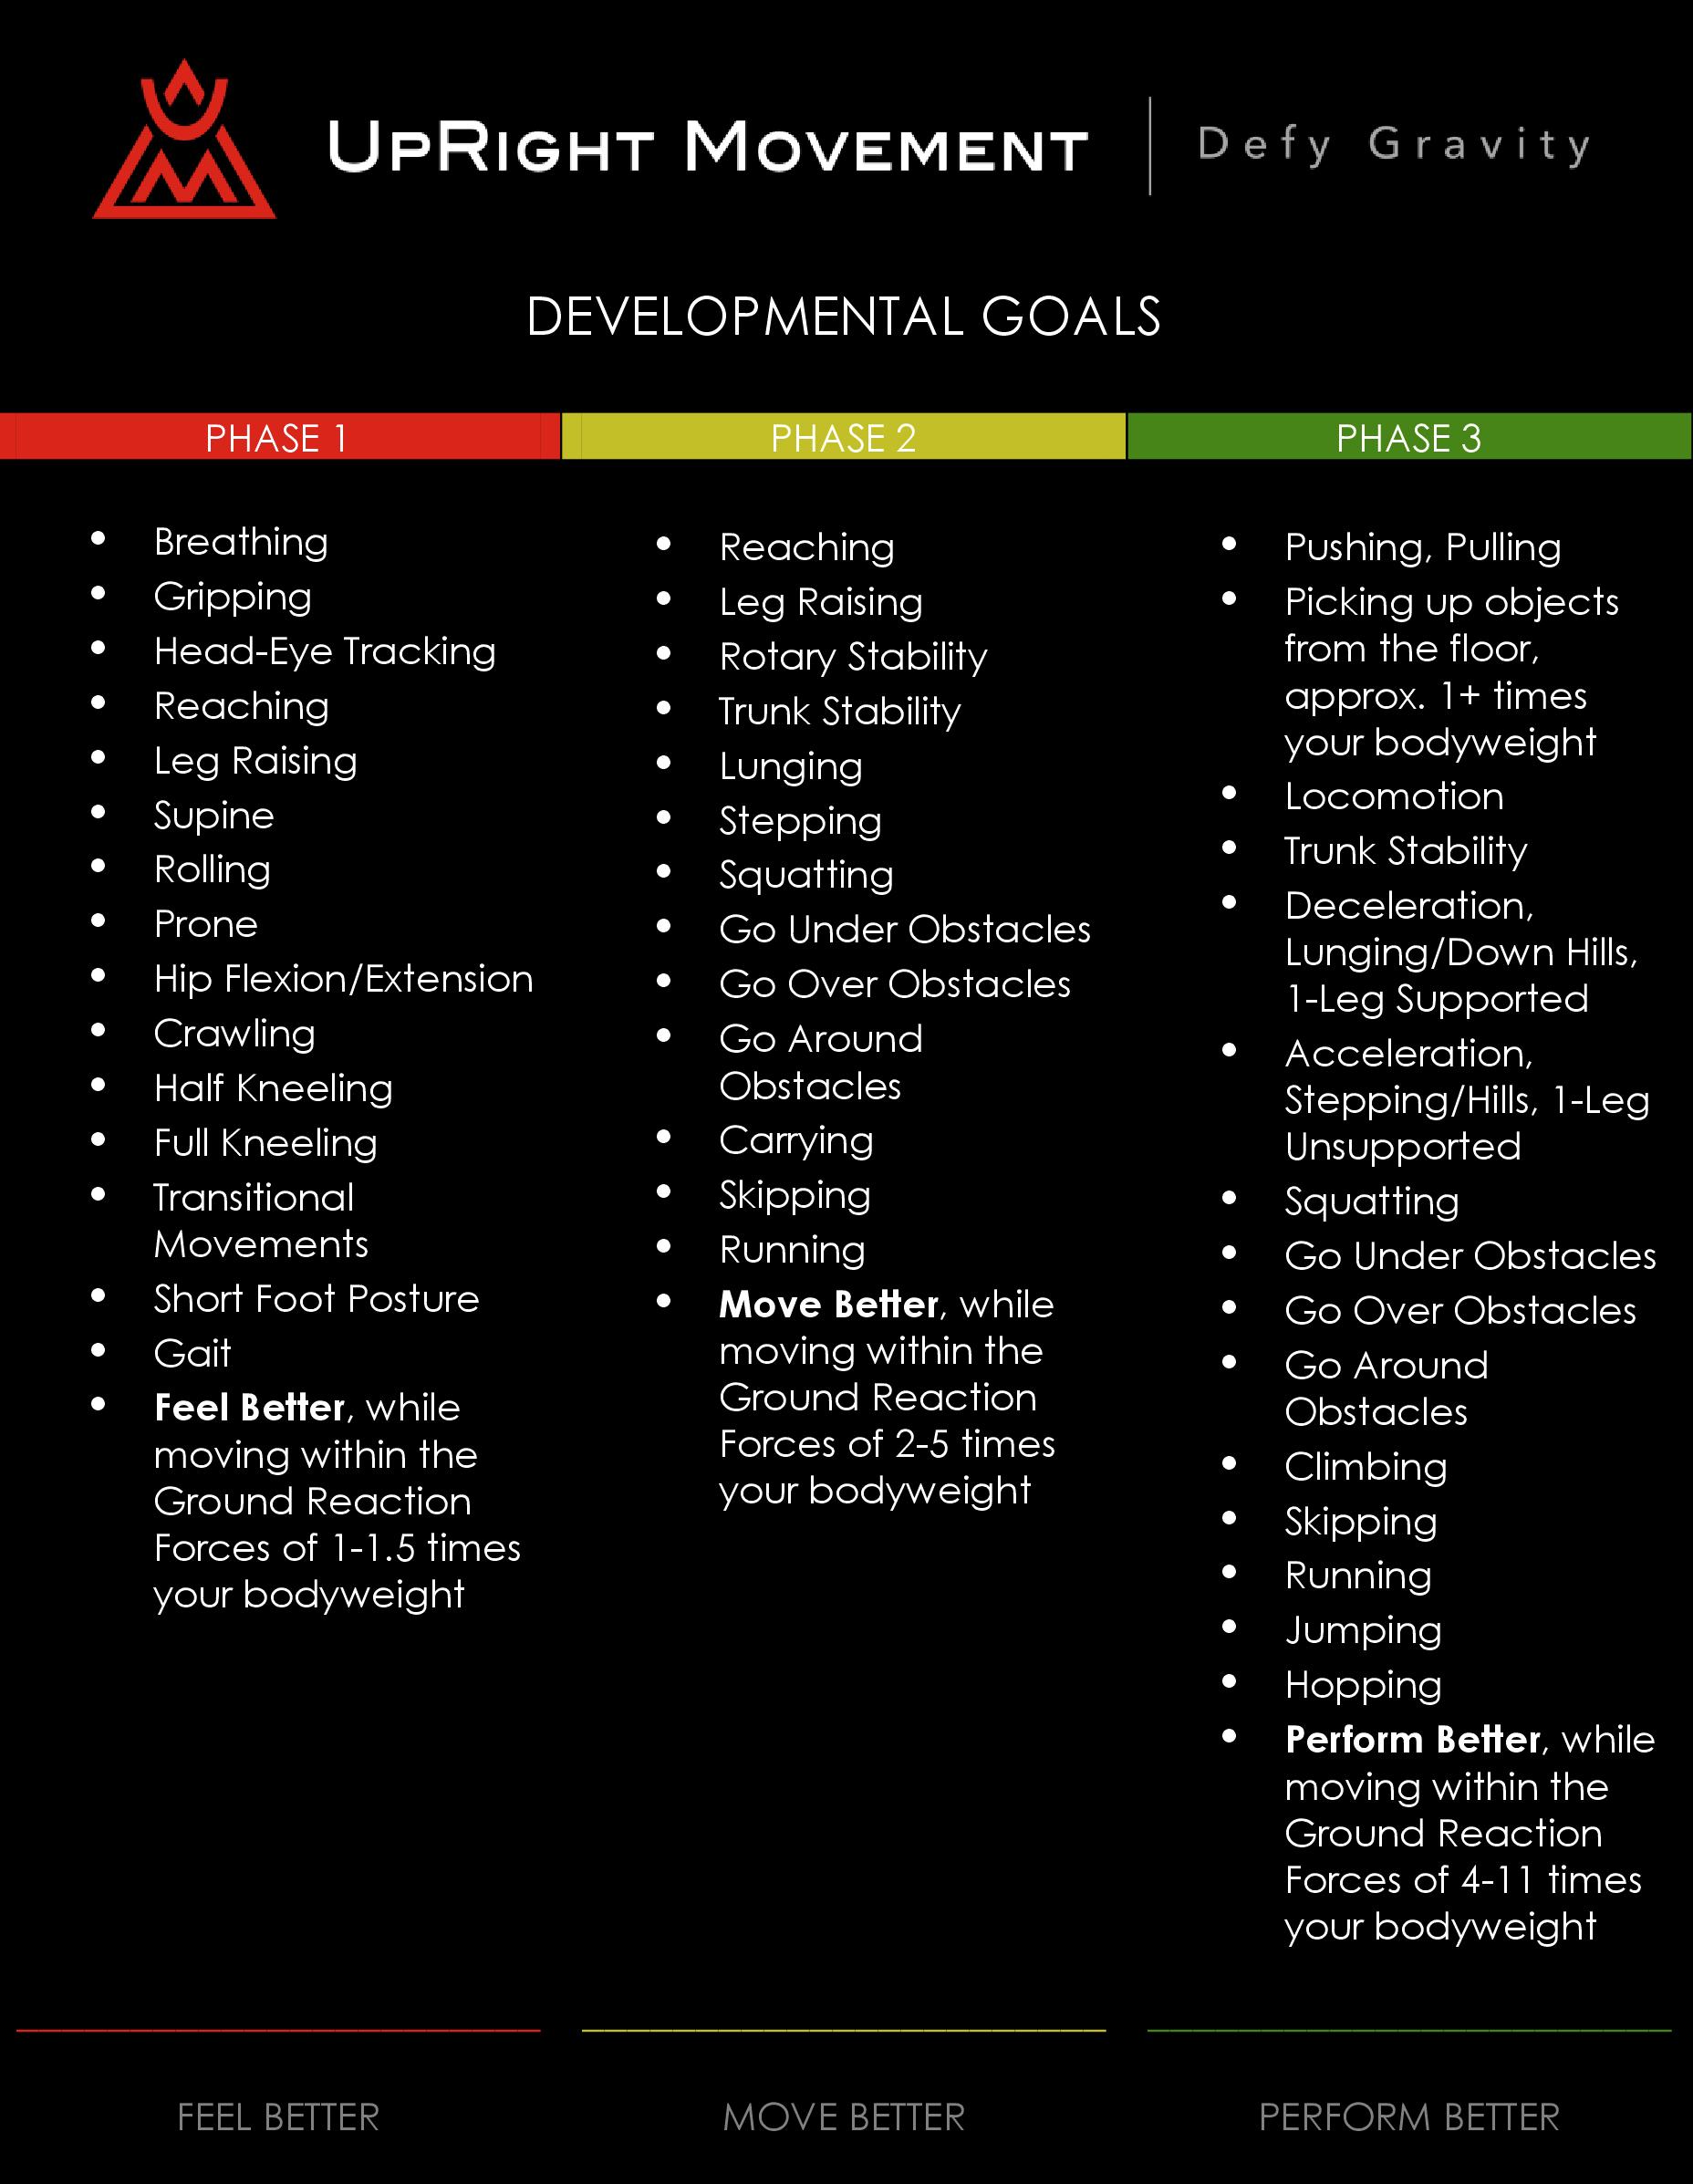 DEVELOPMENTAL-GOALS